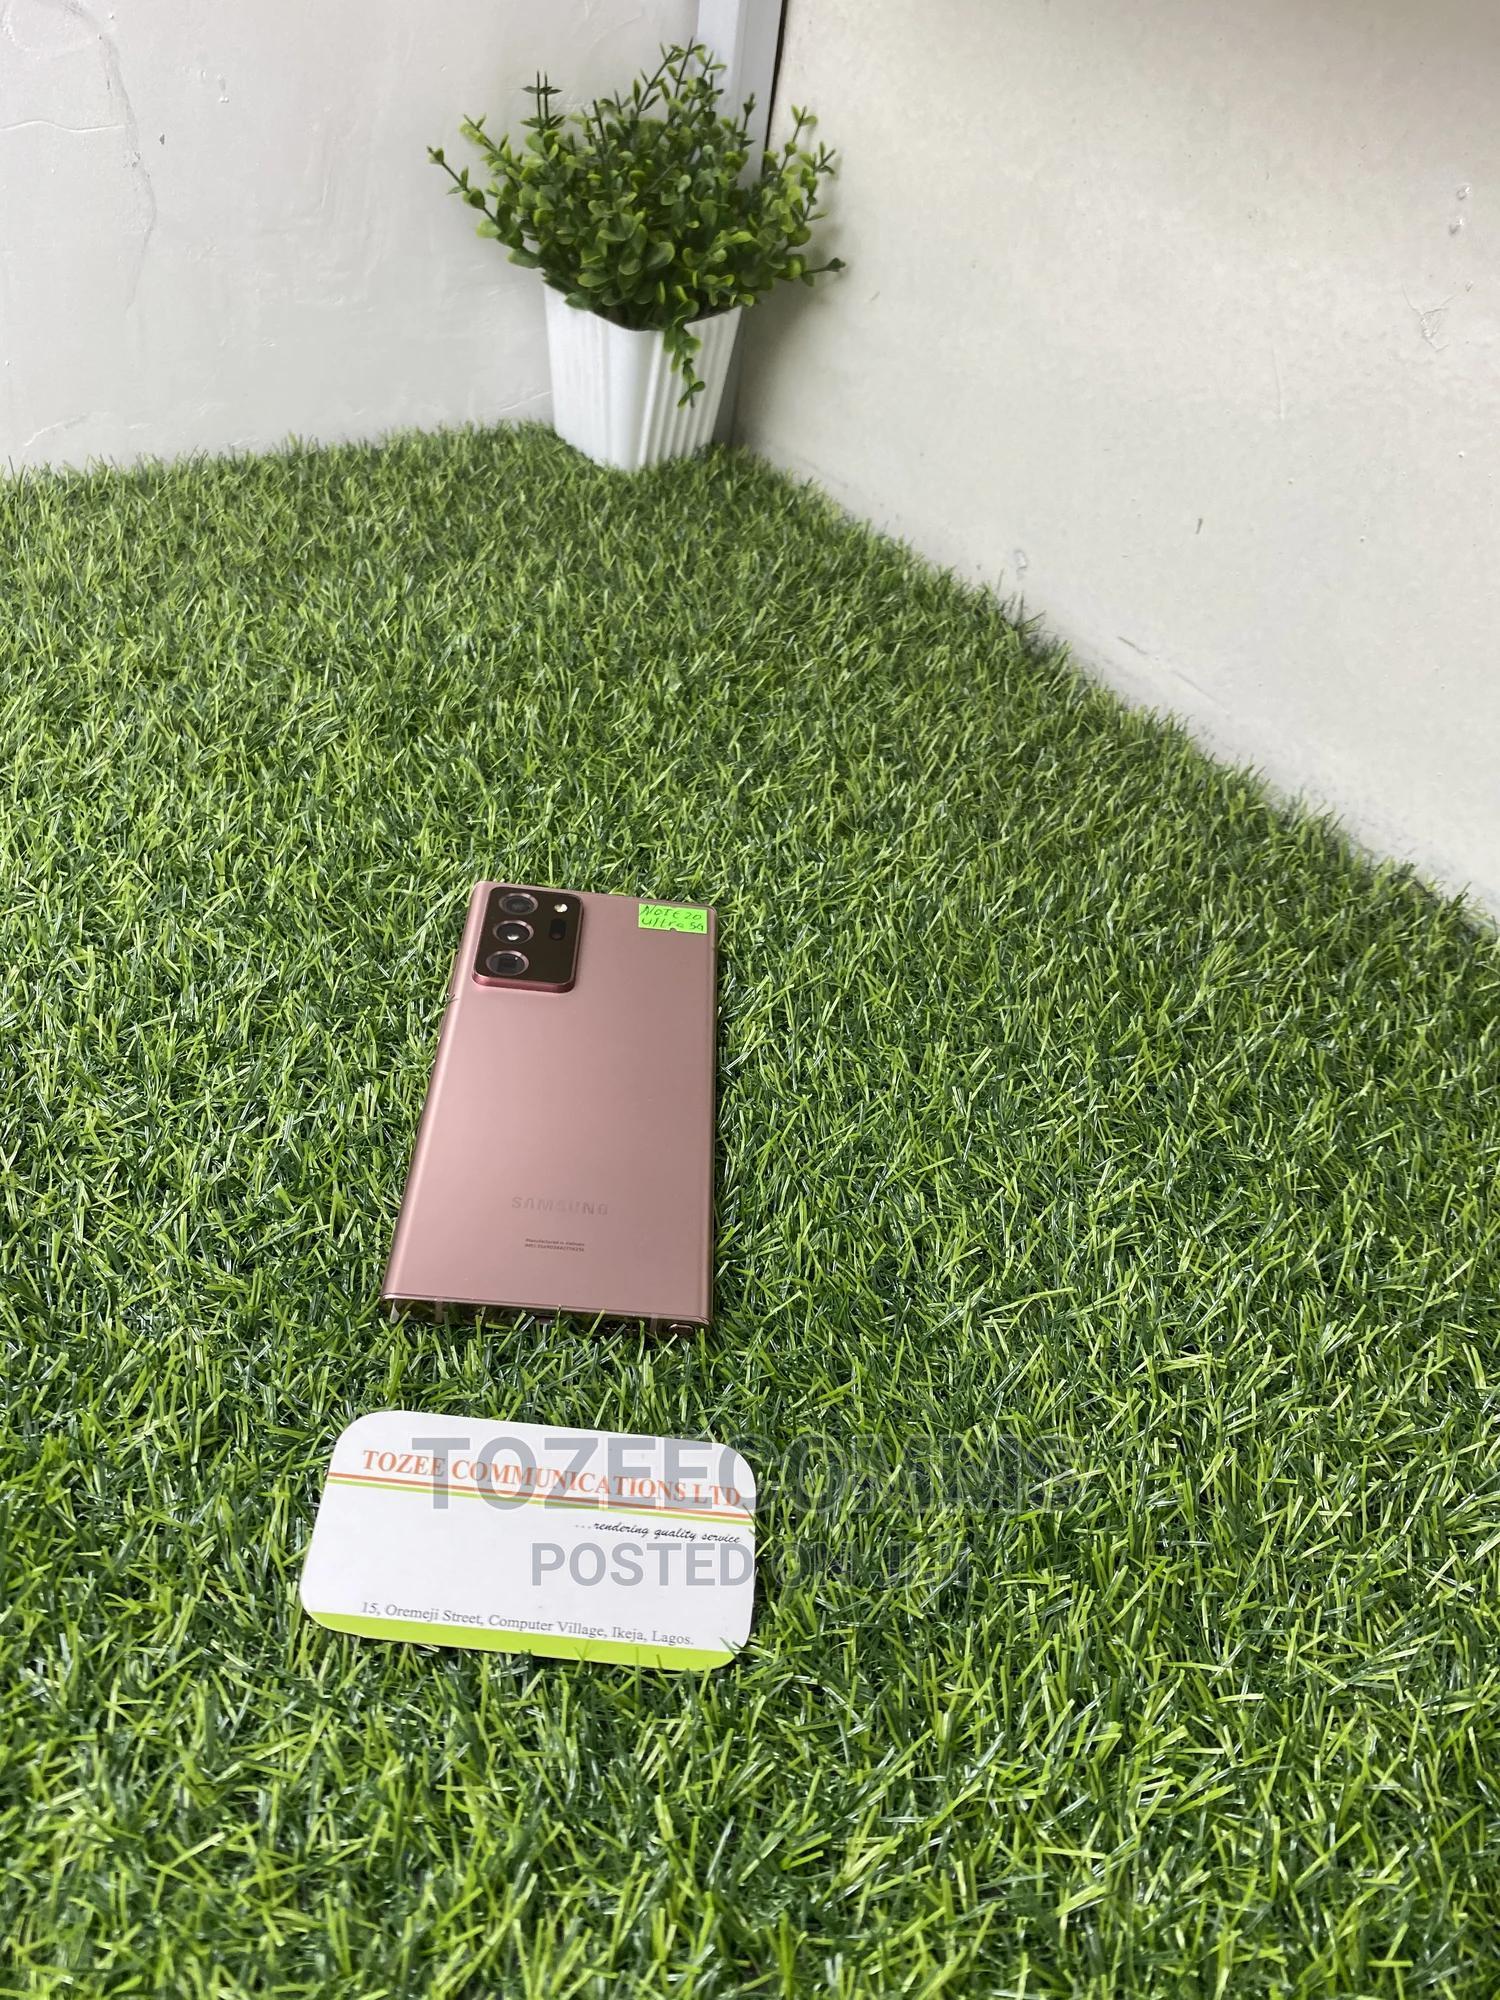 Samsung Galaxy Note 20 Ultra 5G 128GB Gold